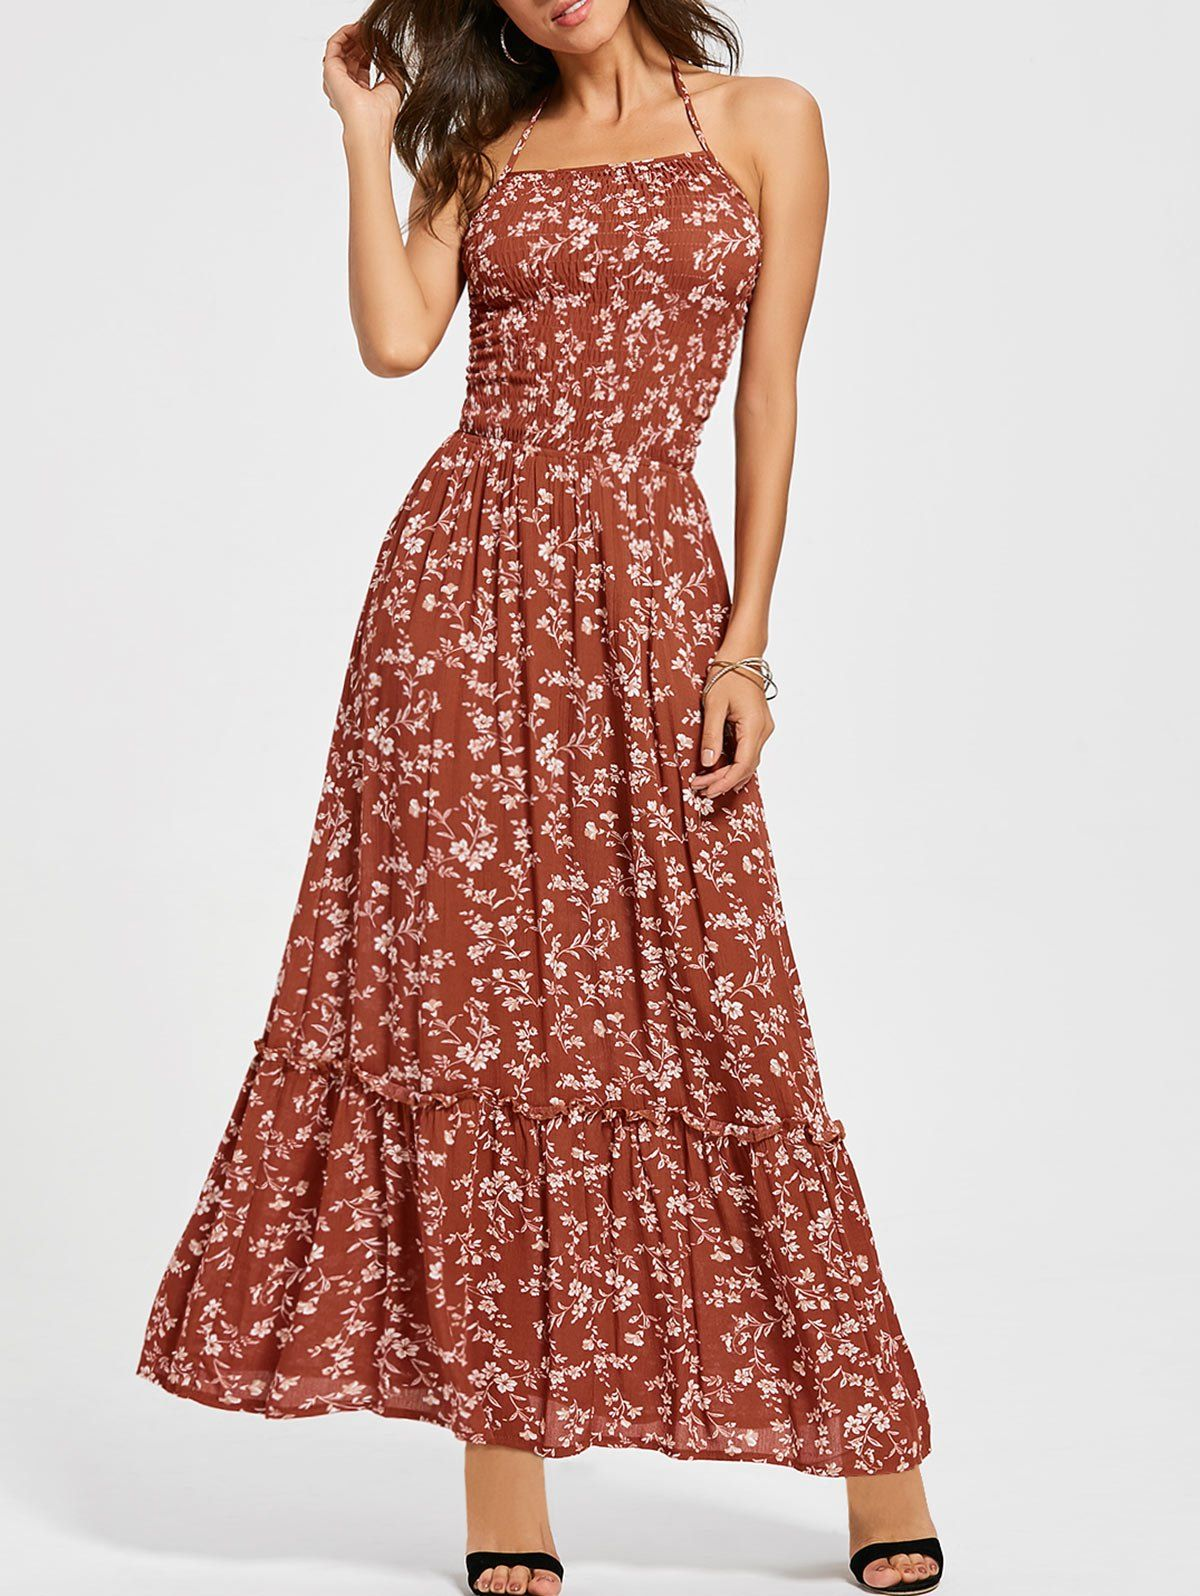 Summer Sleeveless Red Flowers Ankle Length Elastic Beach Dress Maxi Sundress Dresses Women Cheap Dresses